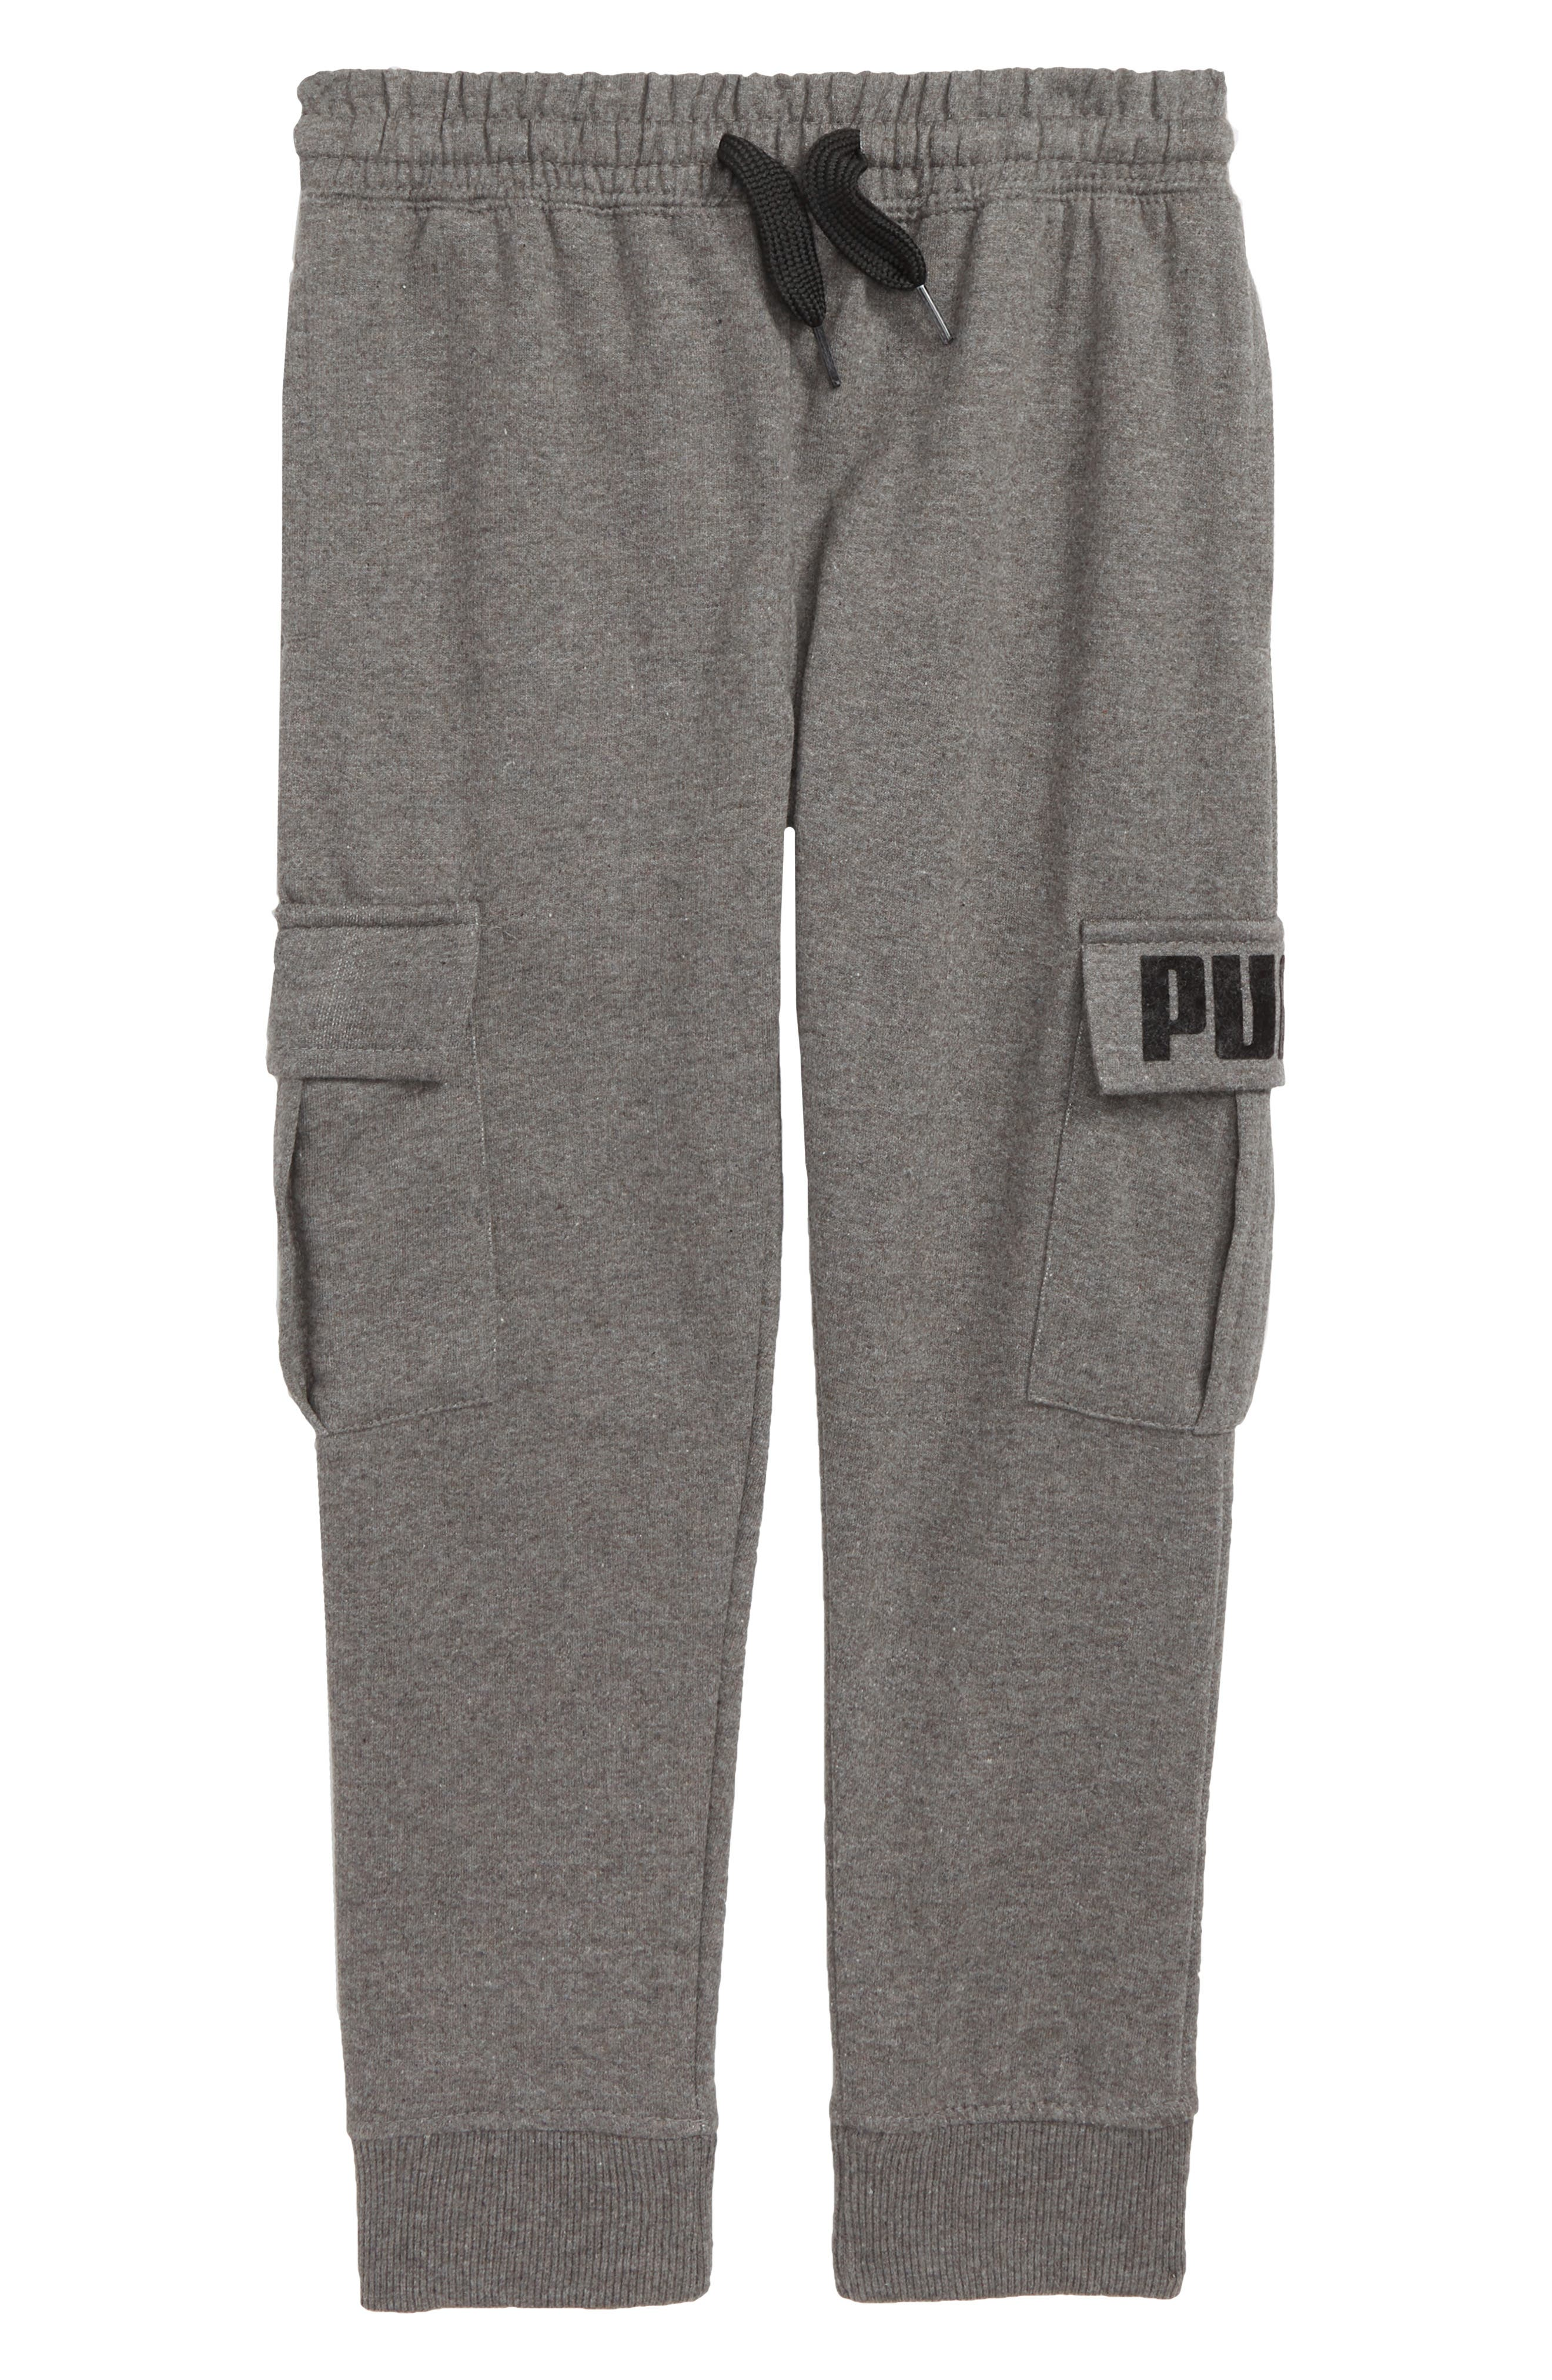 Boys Puma Cargo Pocket Sweatpants